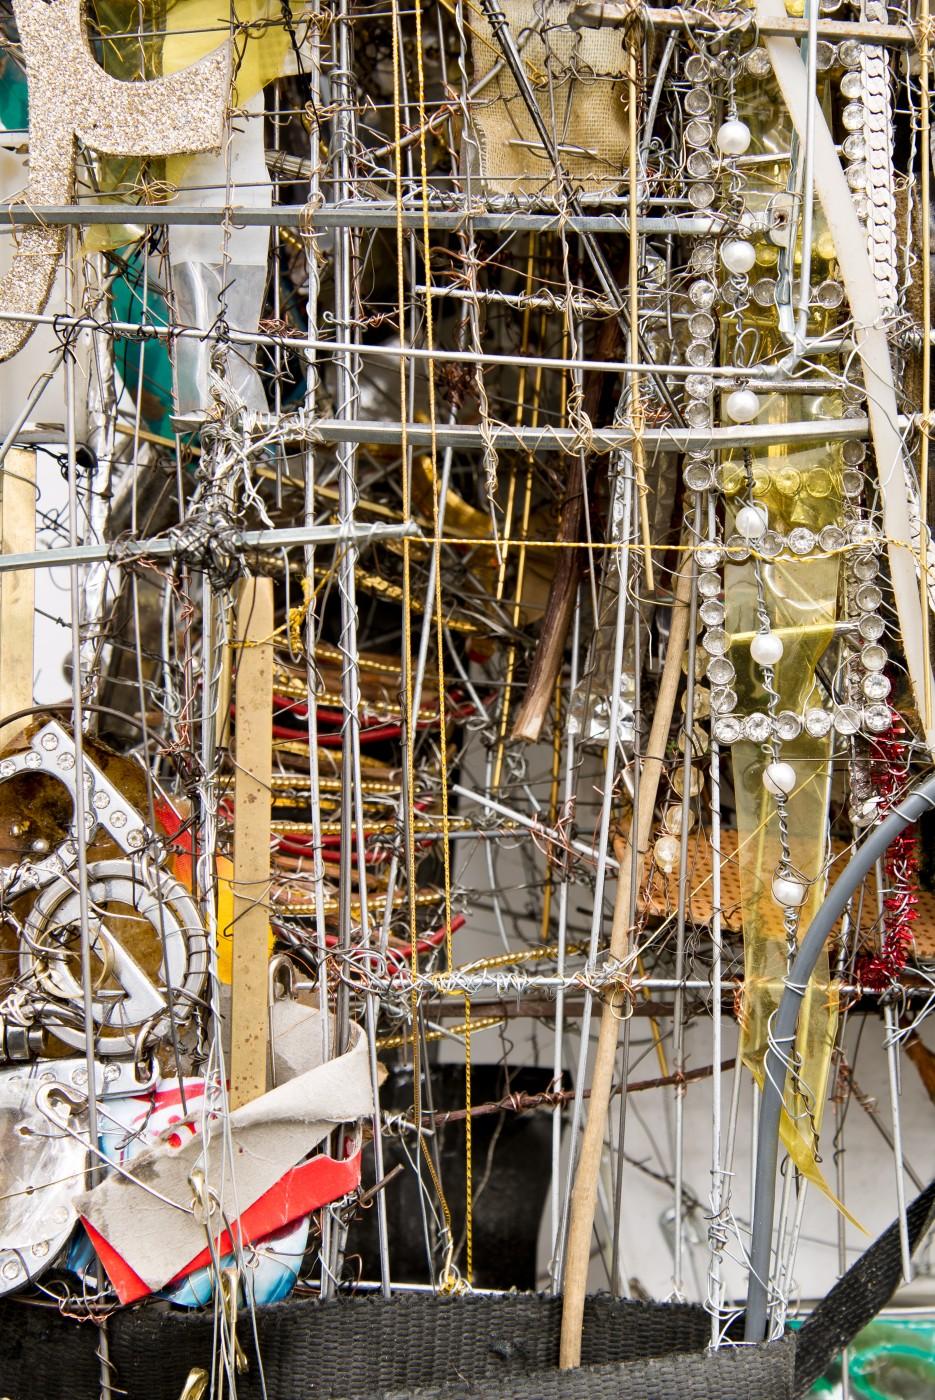 METROPOLITAN  Passion Avenue</I>, 2015 (detail) Mixed media 80 x 67 x 22 cm / 31.5 x 26.3 x 8.6 in  ROBERT BITTENBENDER